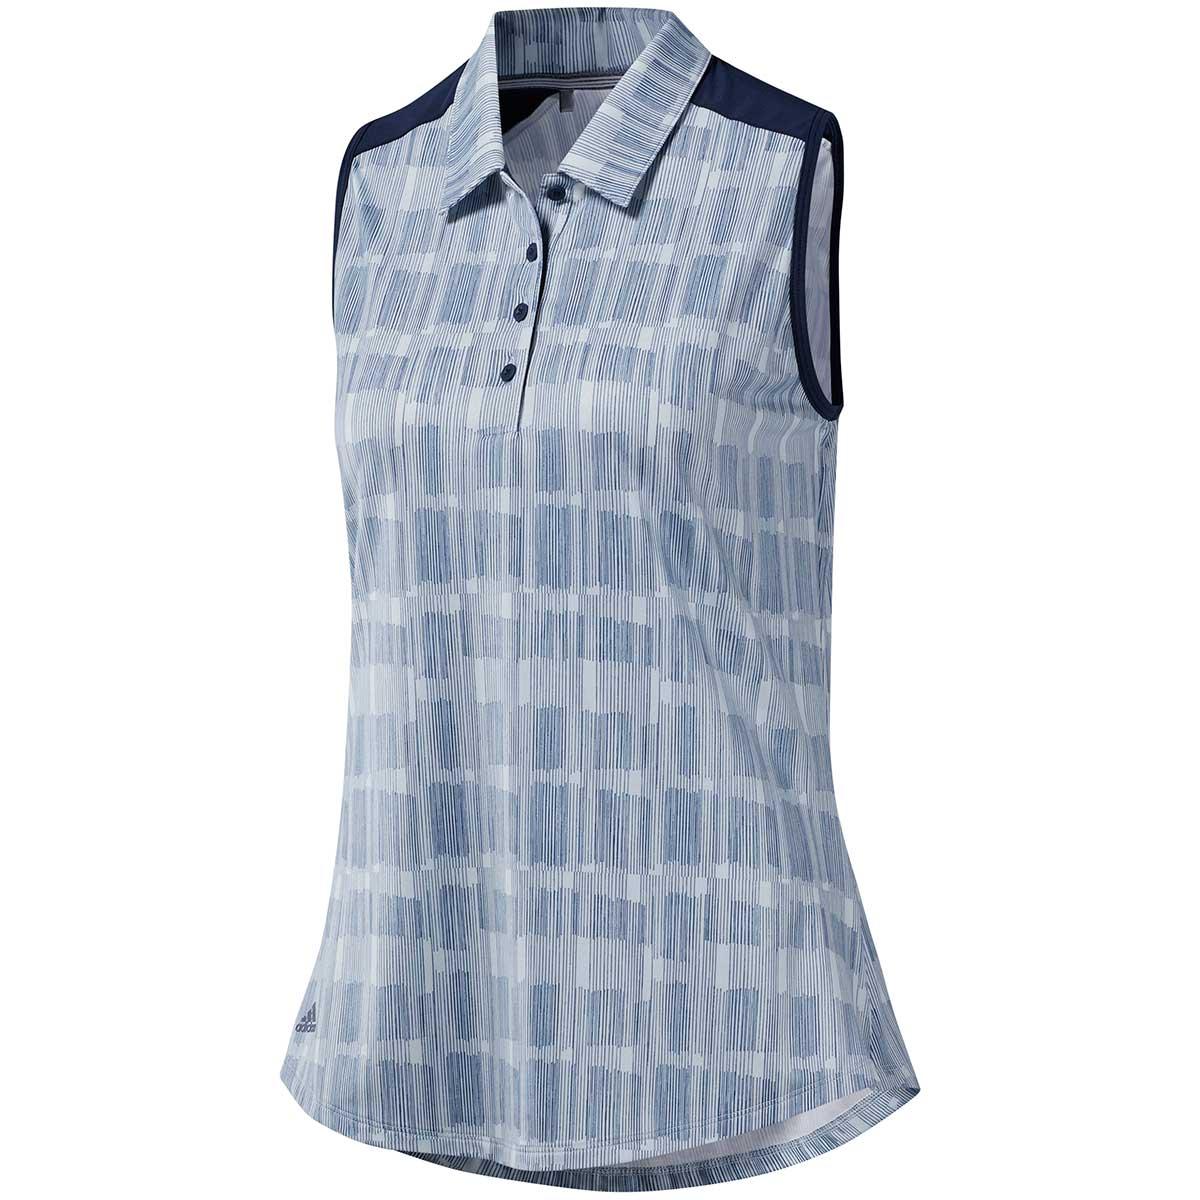 Adidas Women's Ultimate365 Printed Polo Shirt - Aero Blue